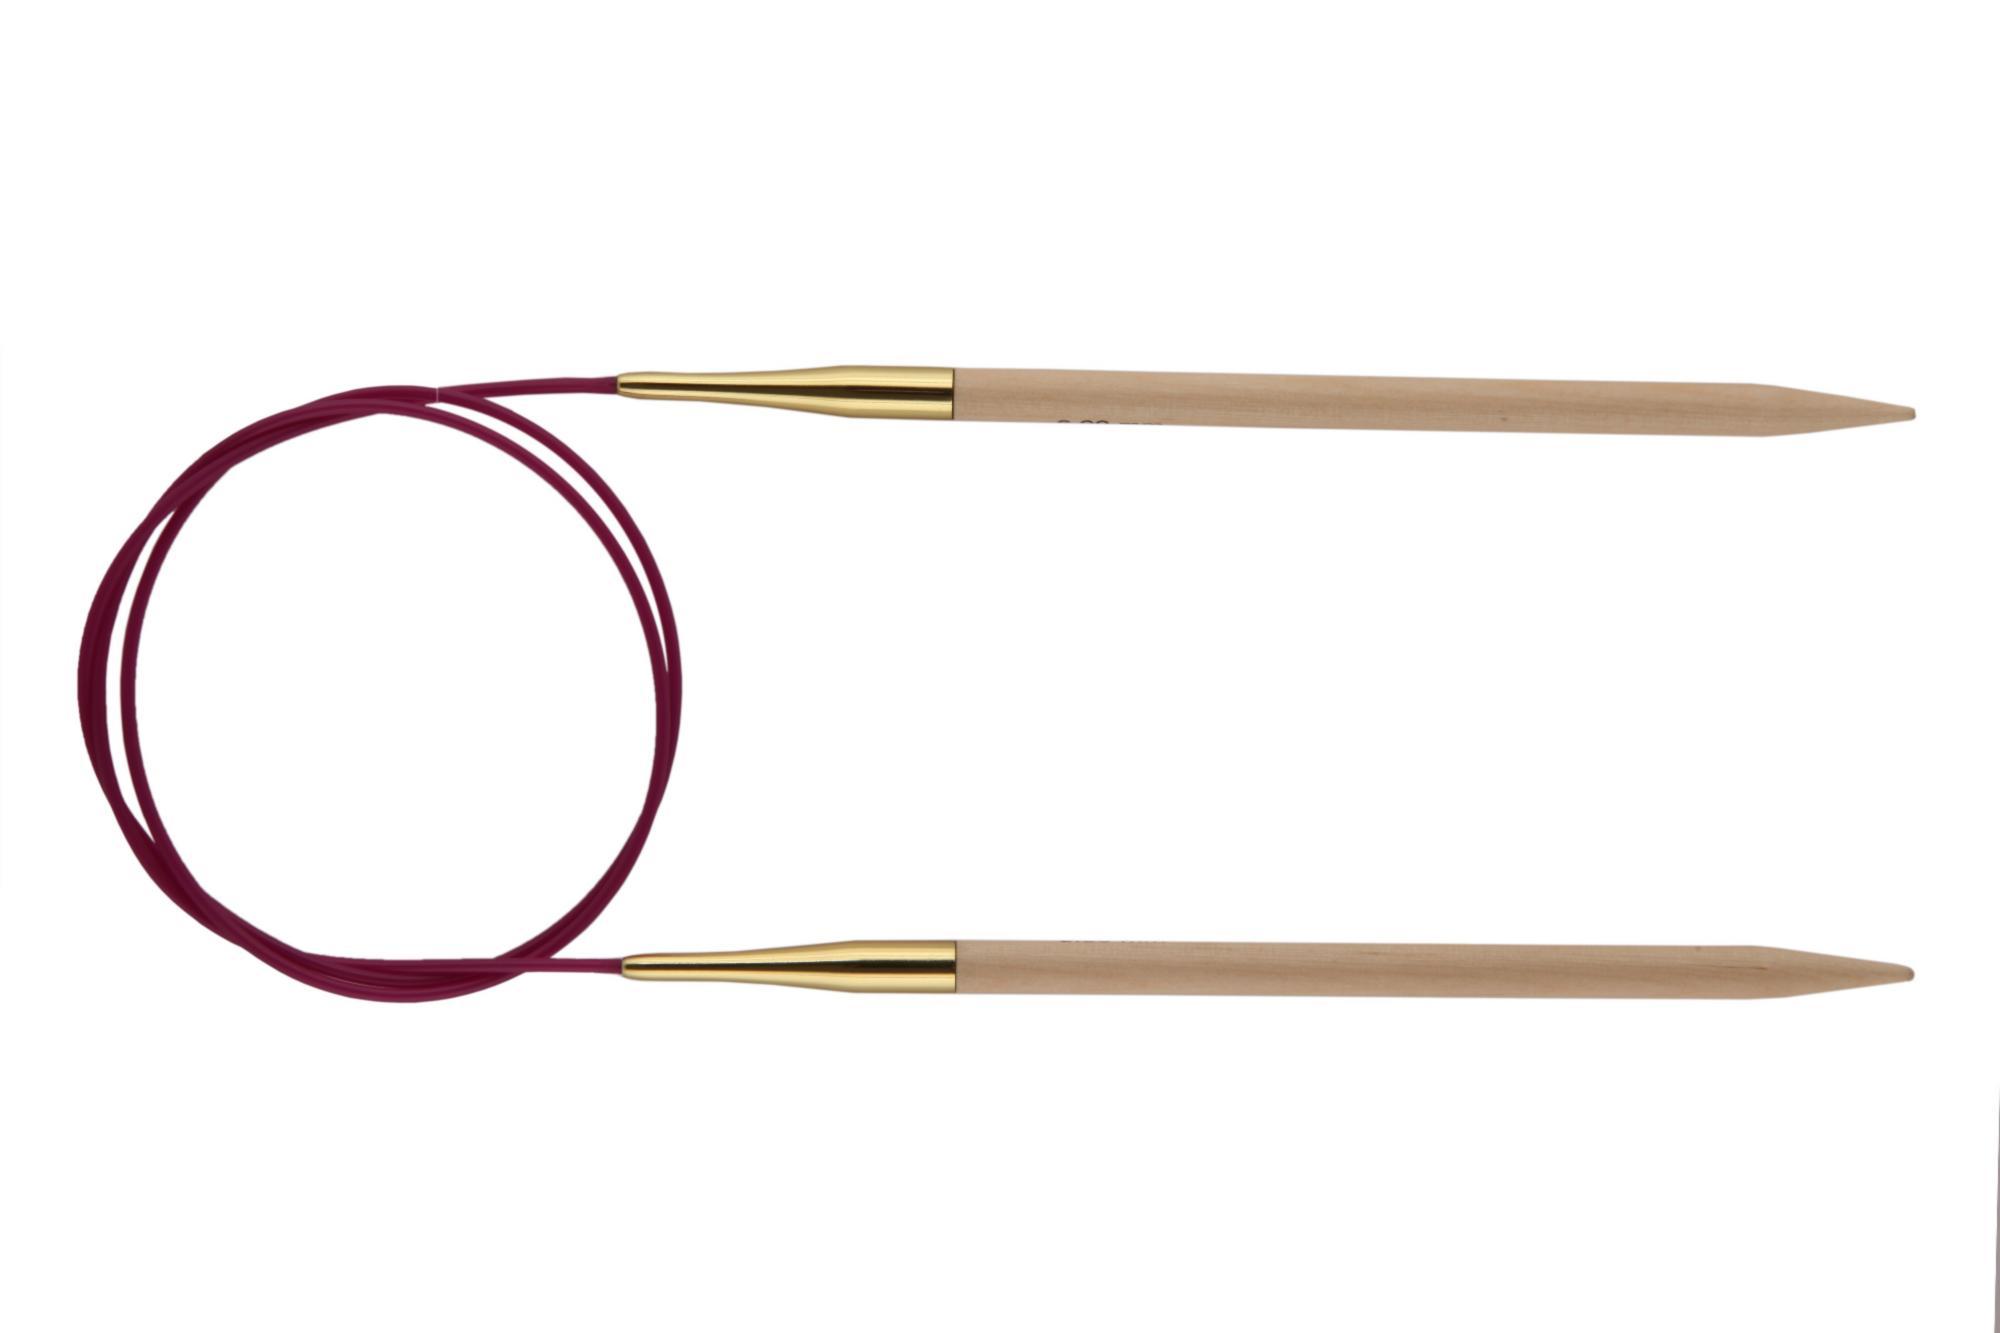 Спицы круговые 150 см Basix Birch Wood KnitPro, 35410, 3.00 мм